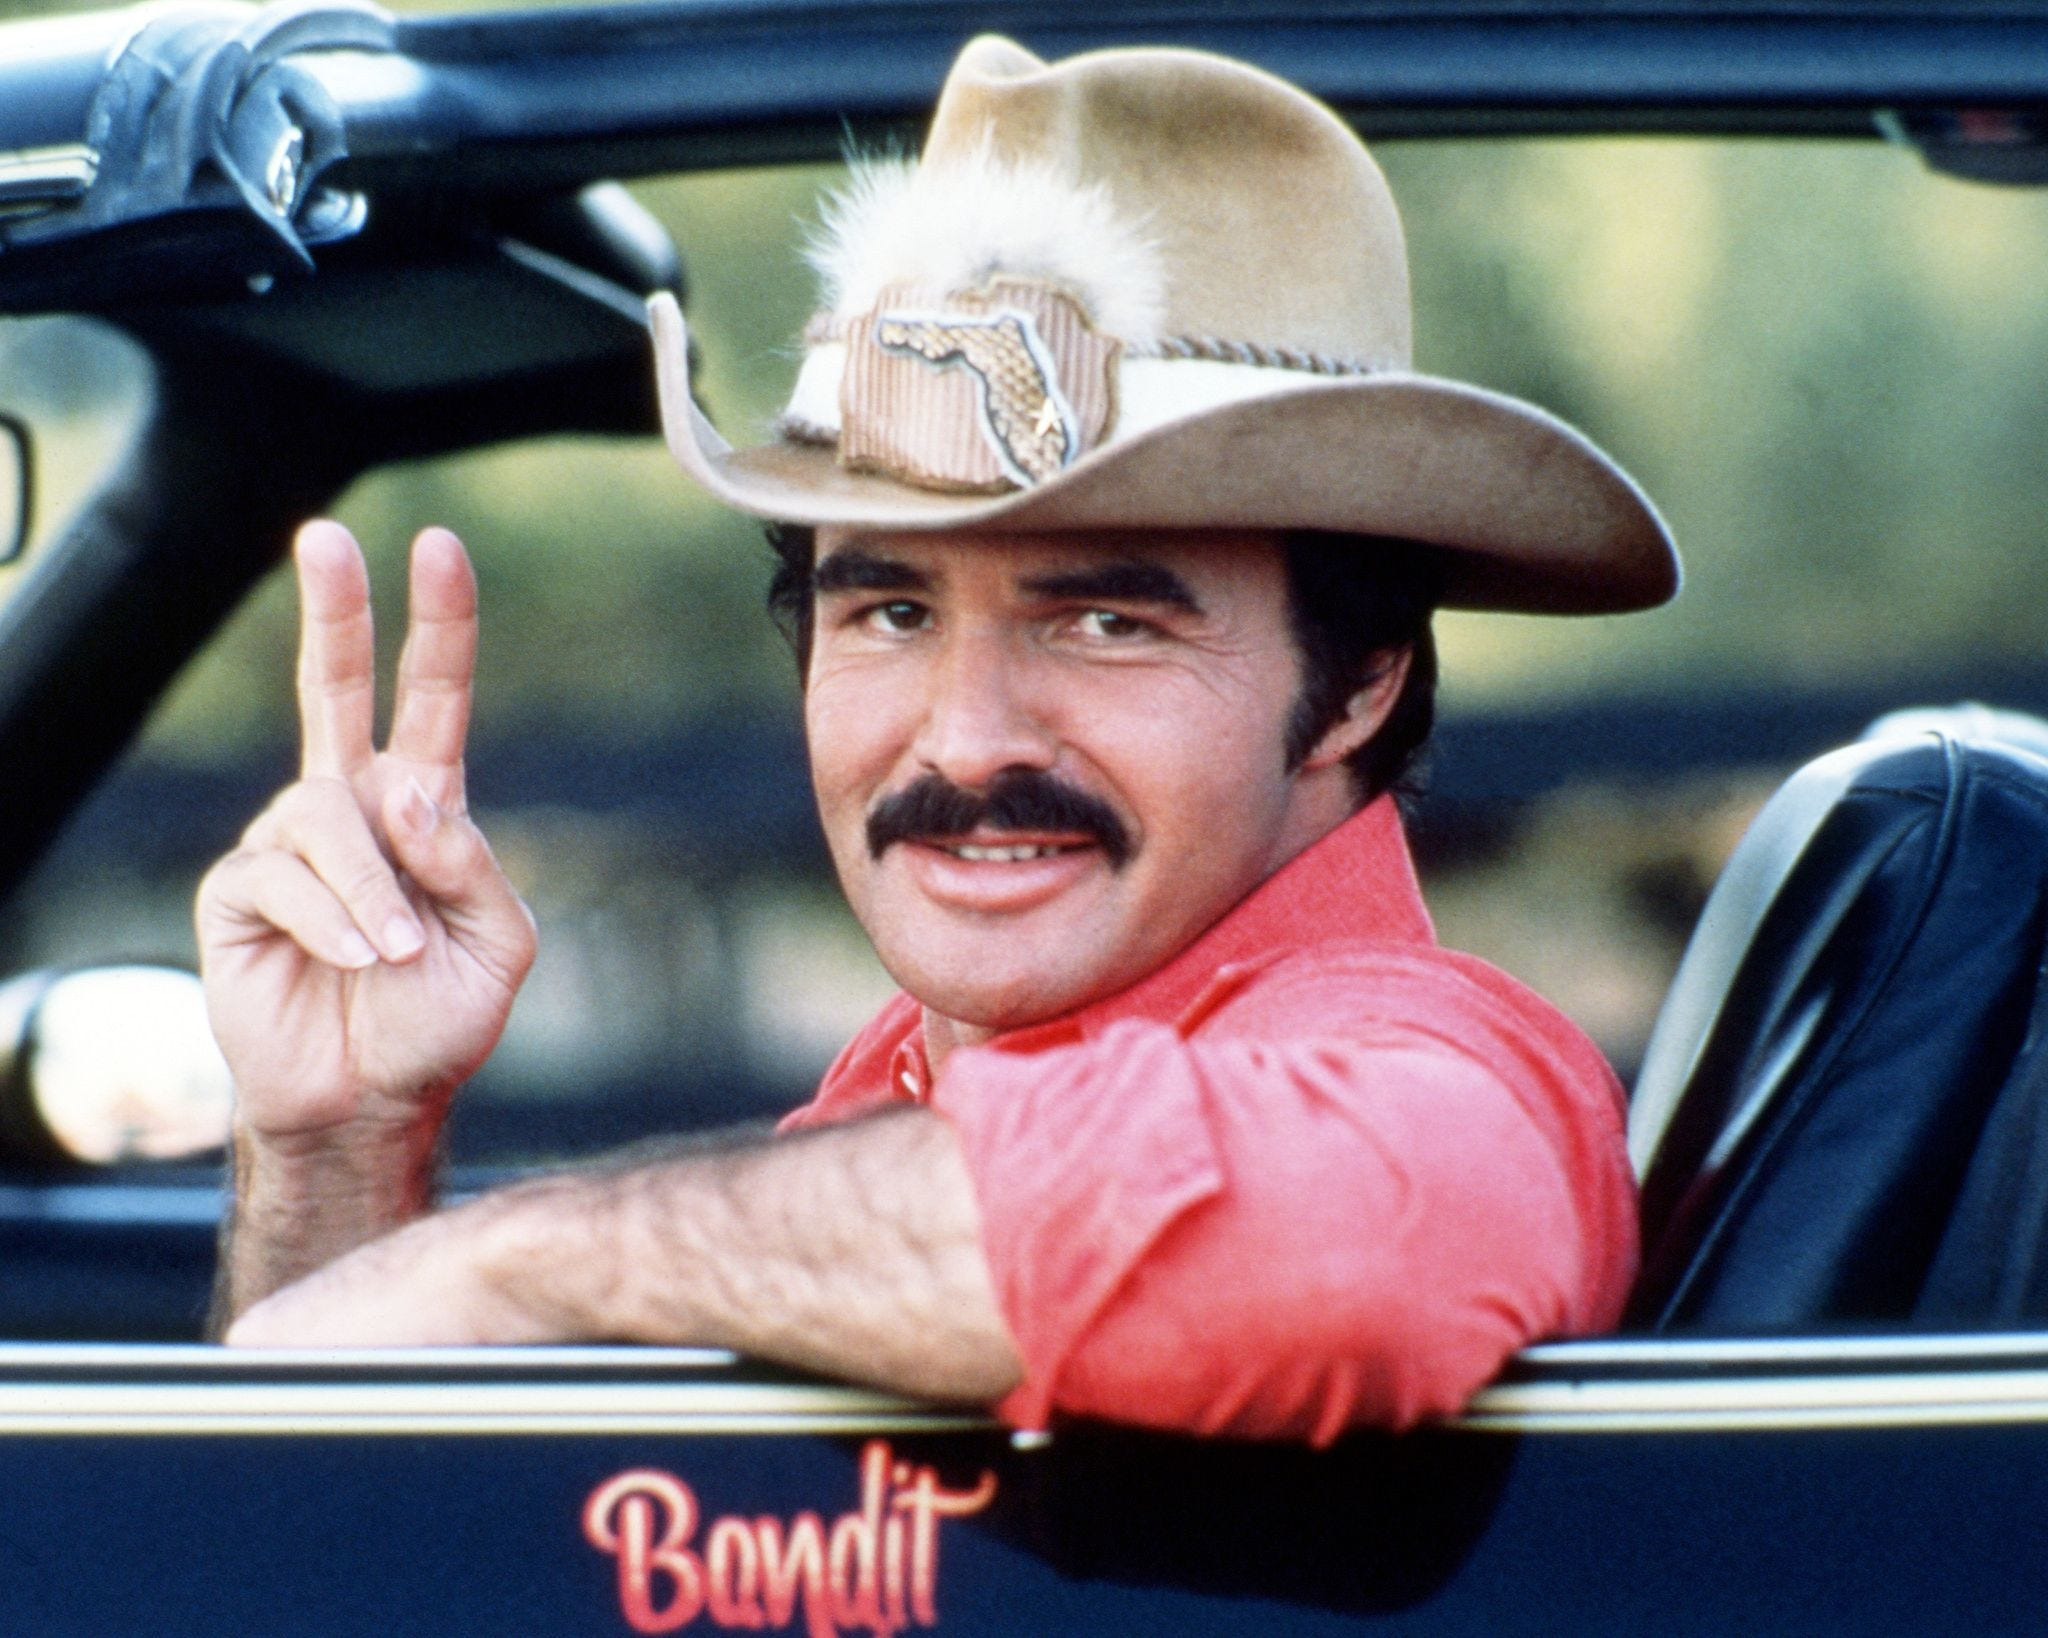 Burt Reynolds and his many ties to Florida - Mims Florida